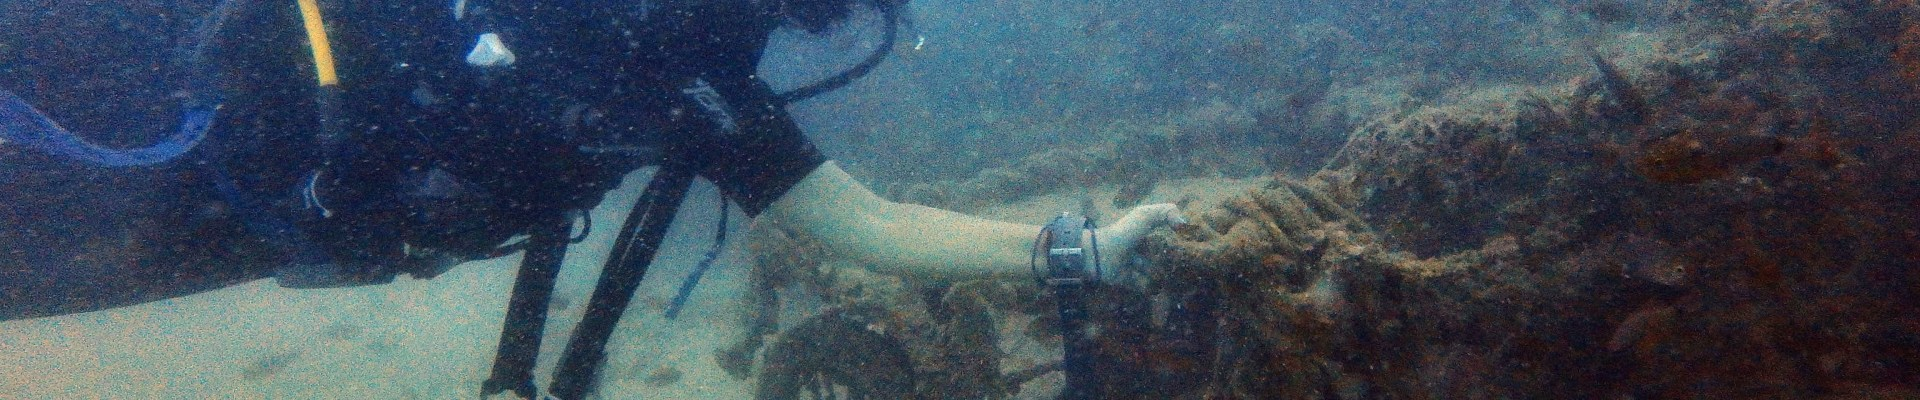 Scuba diving in Pondicherry (East Coast, India)